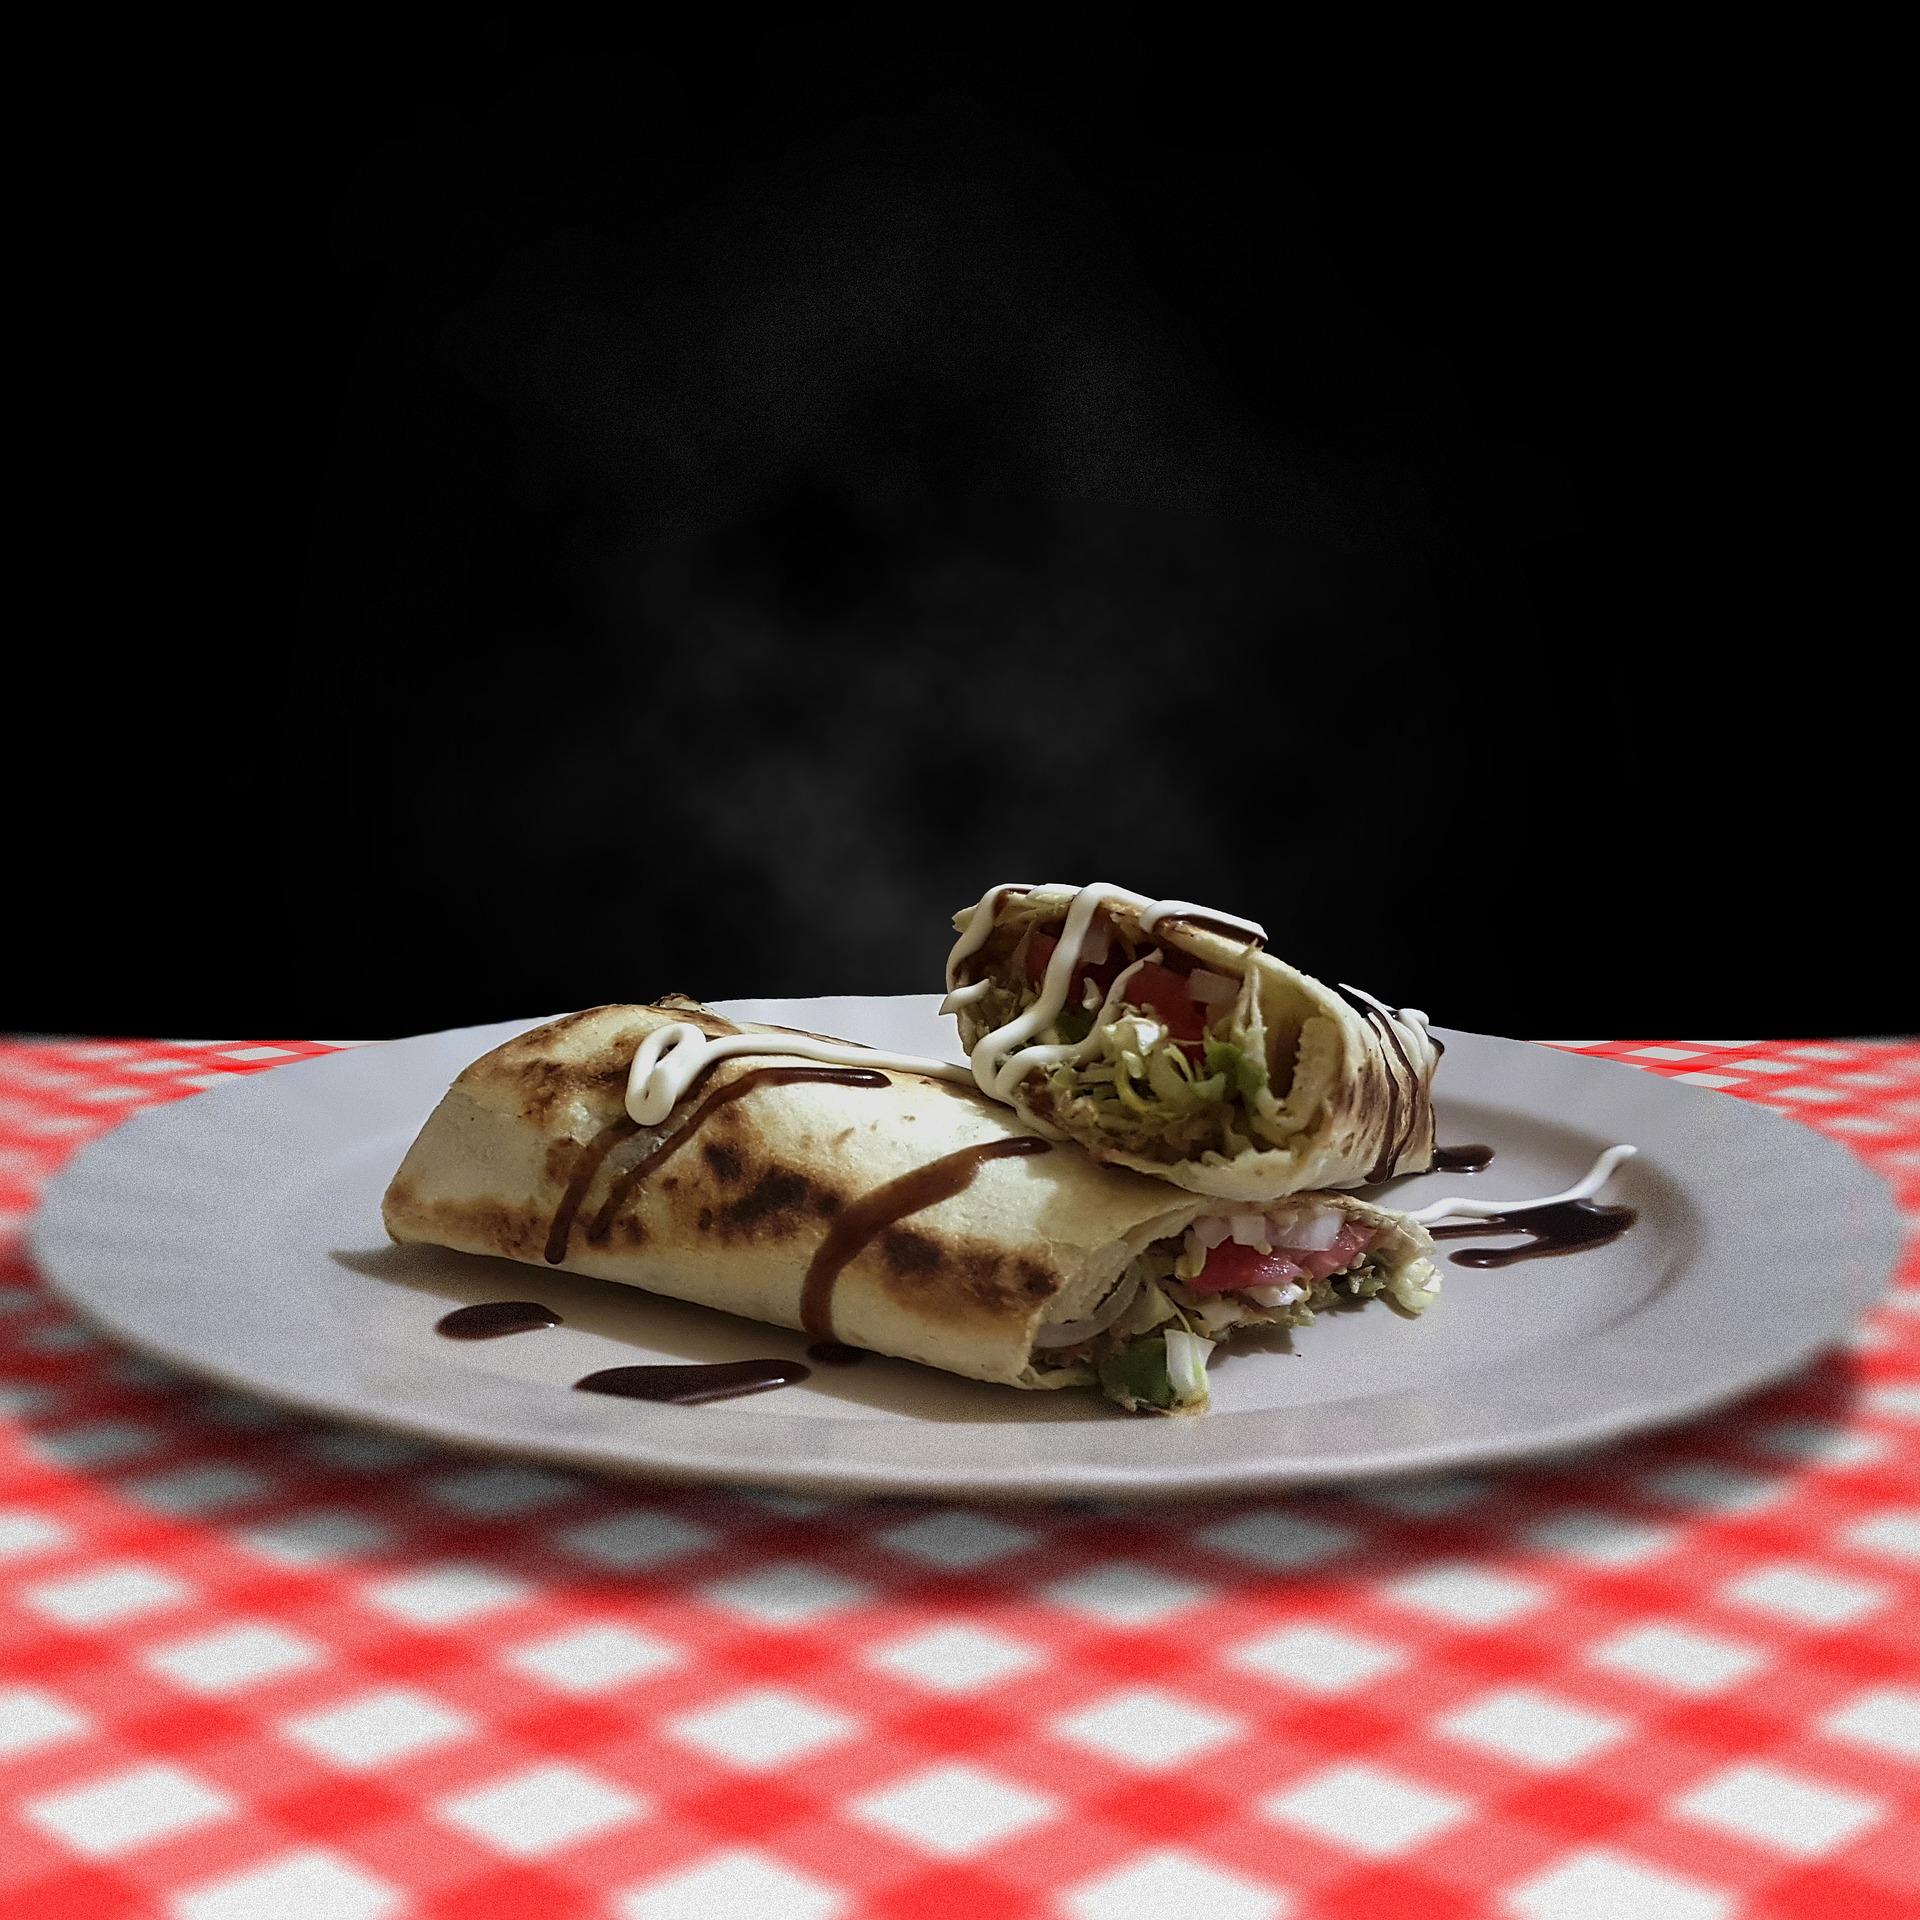 Shaorma de pui facuta in casa - sfatulparintilor.ro - pixabay_com - burrito-3500846_1920